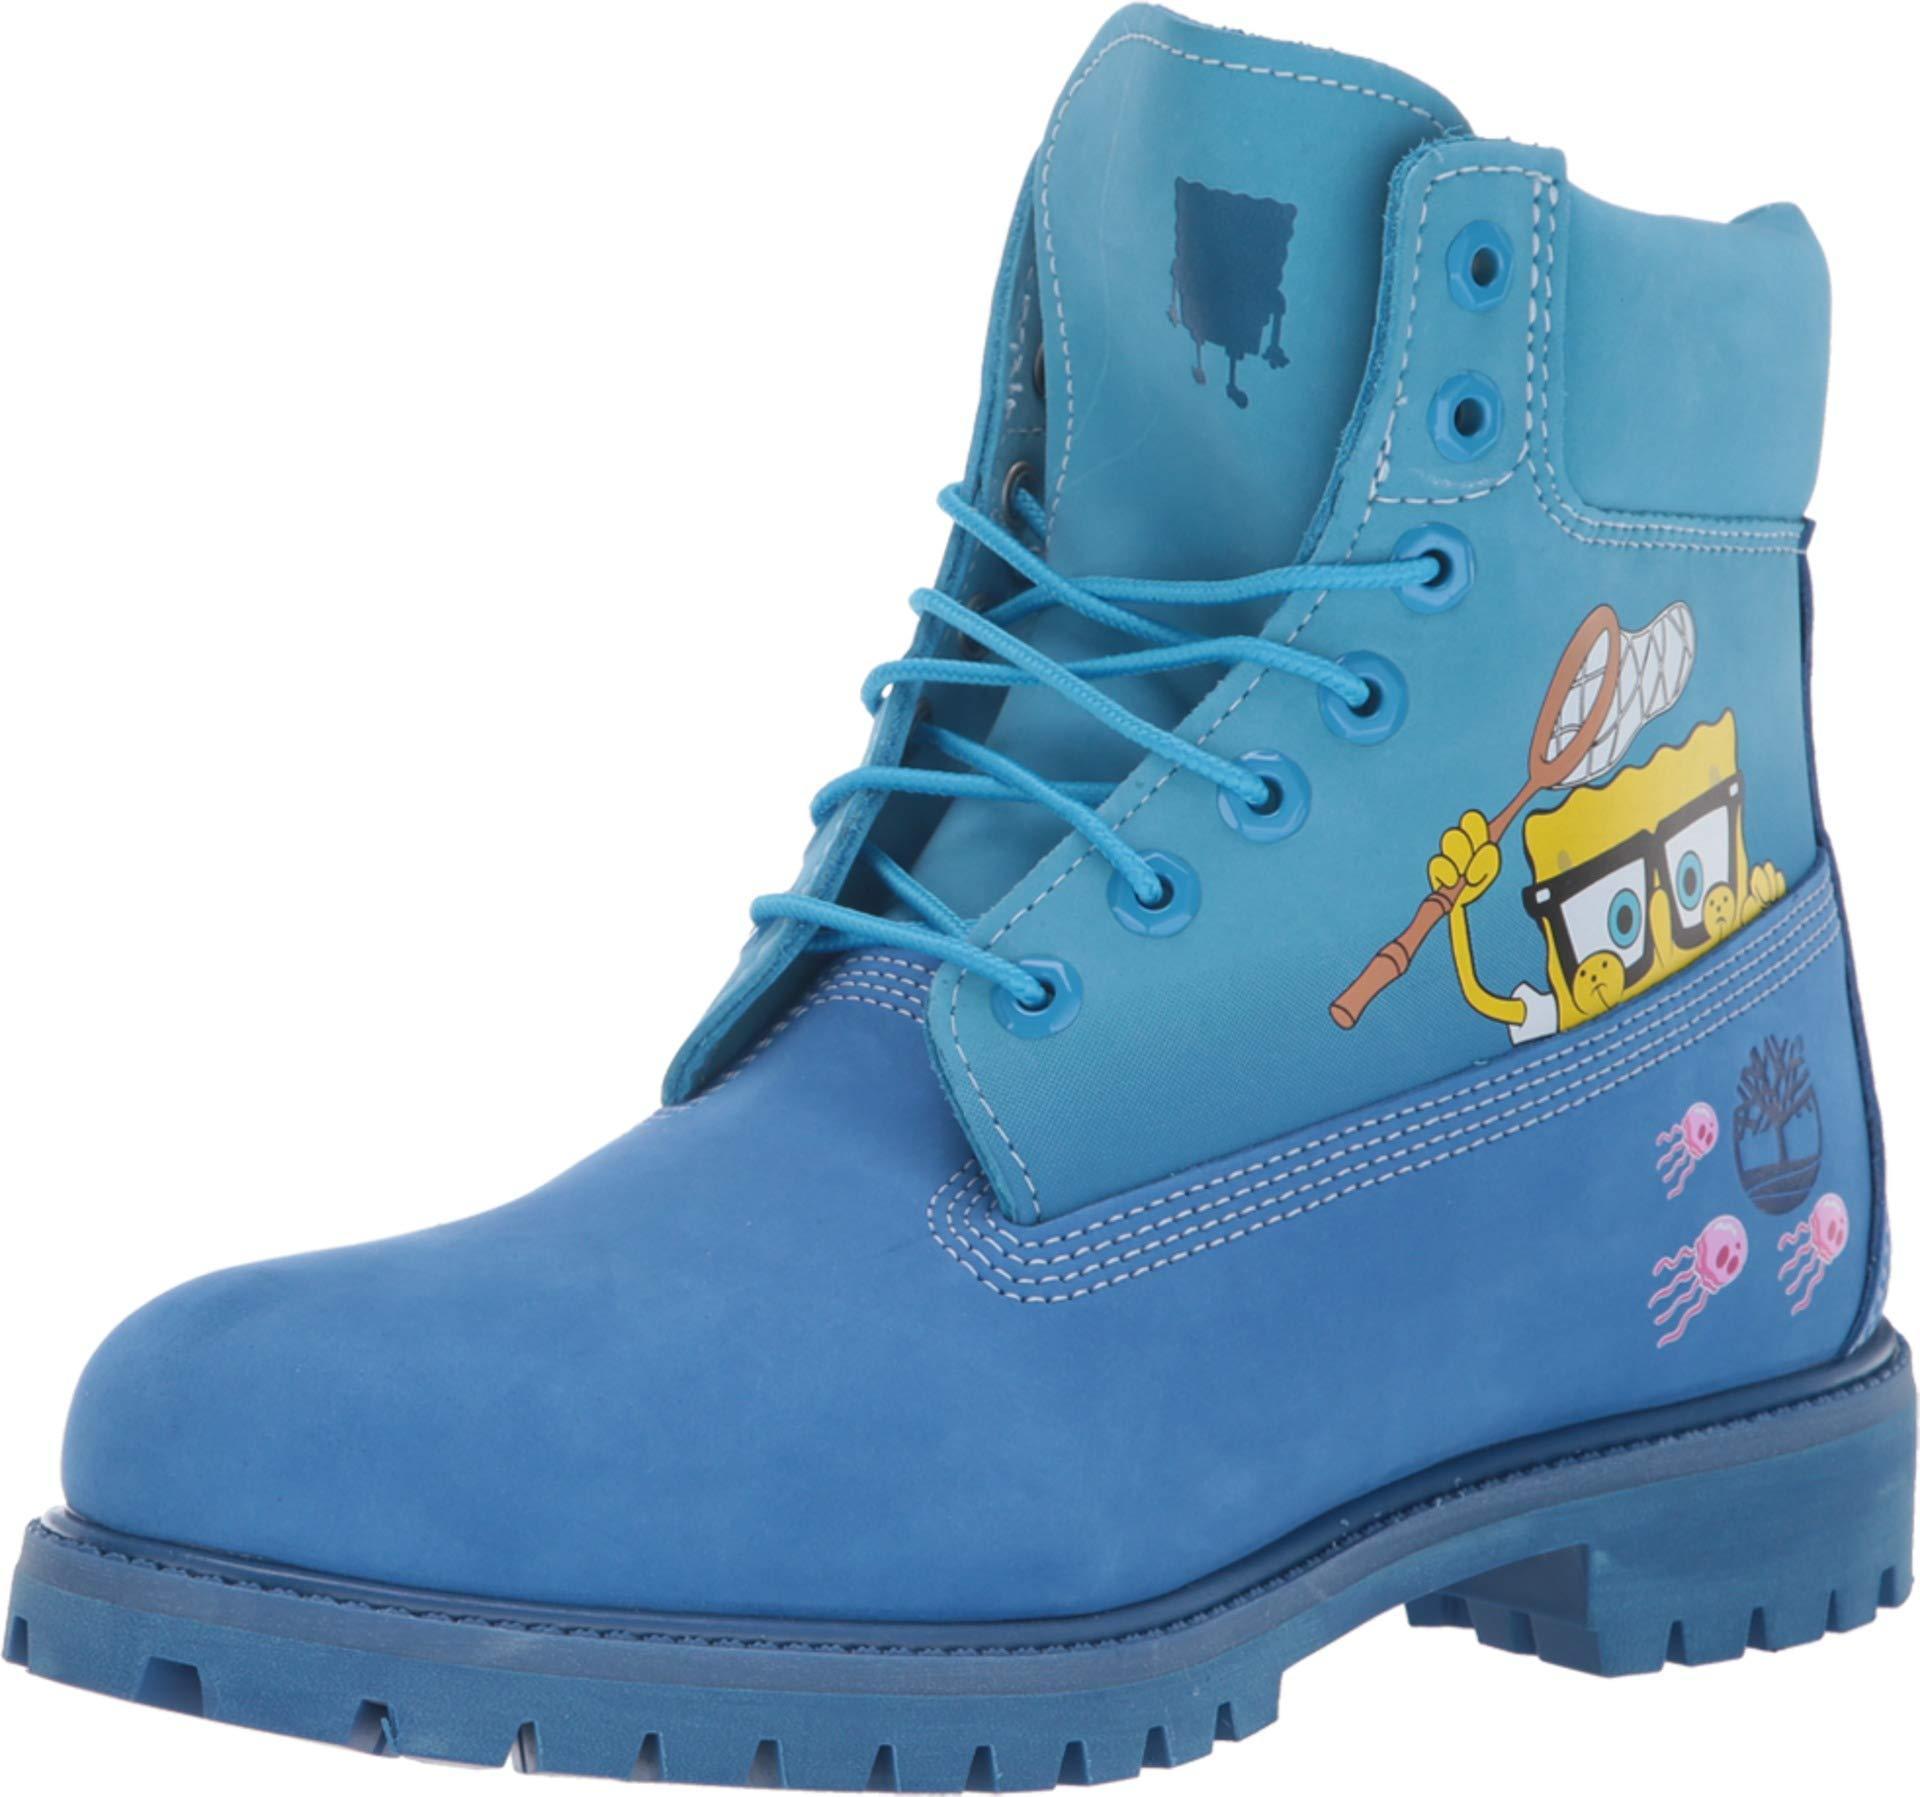 Timberland Men's Spongebob Squarepants X 6 Inch Premium